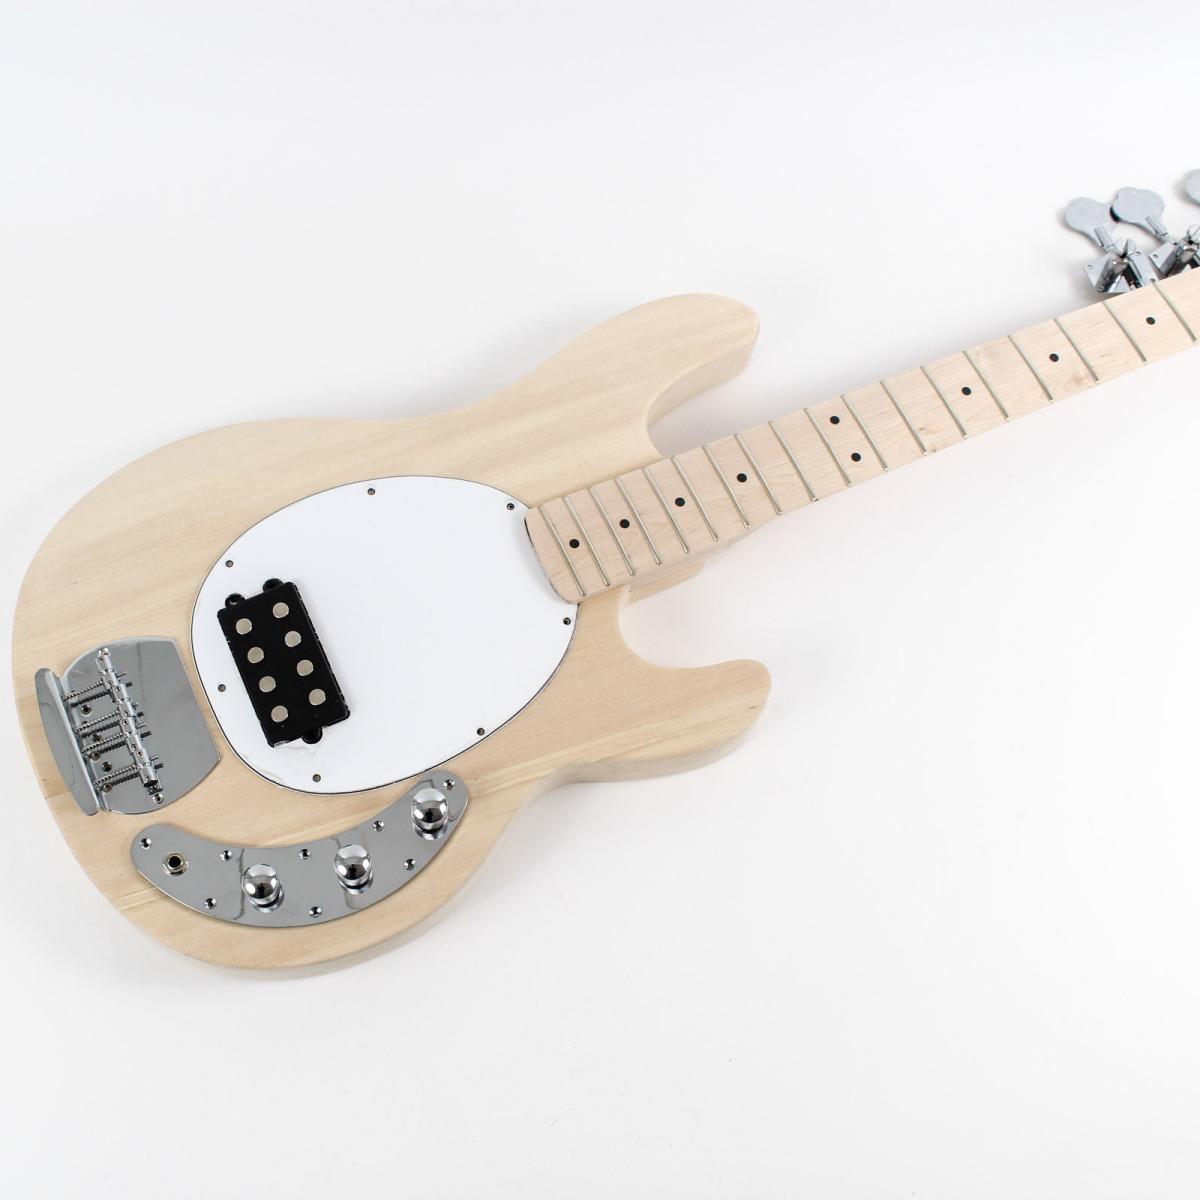 music man stingray bass guitar kit diy guitars. Black Bedroom Furniture Sets. Home Design Ideas